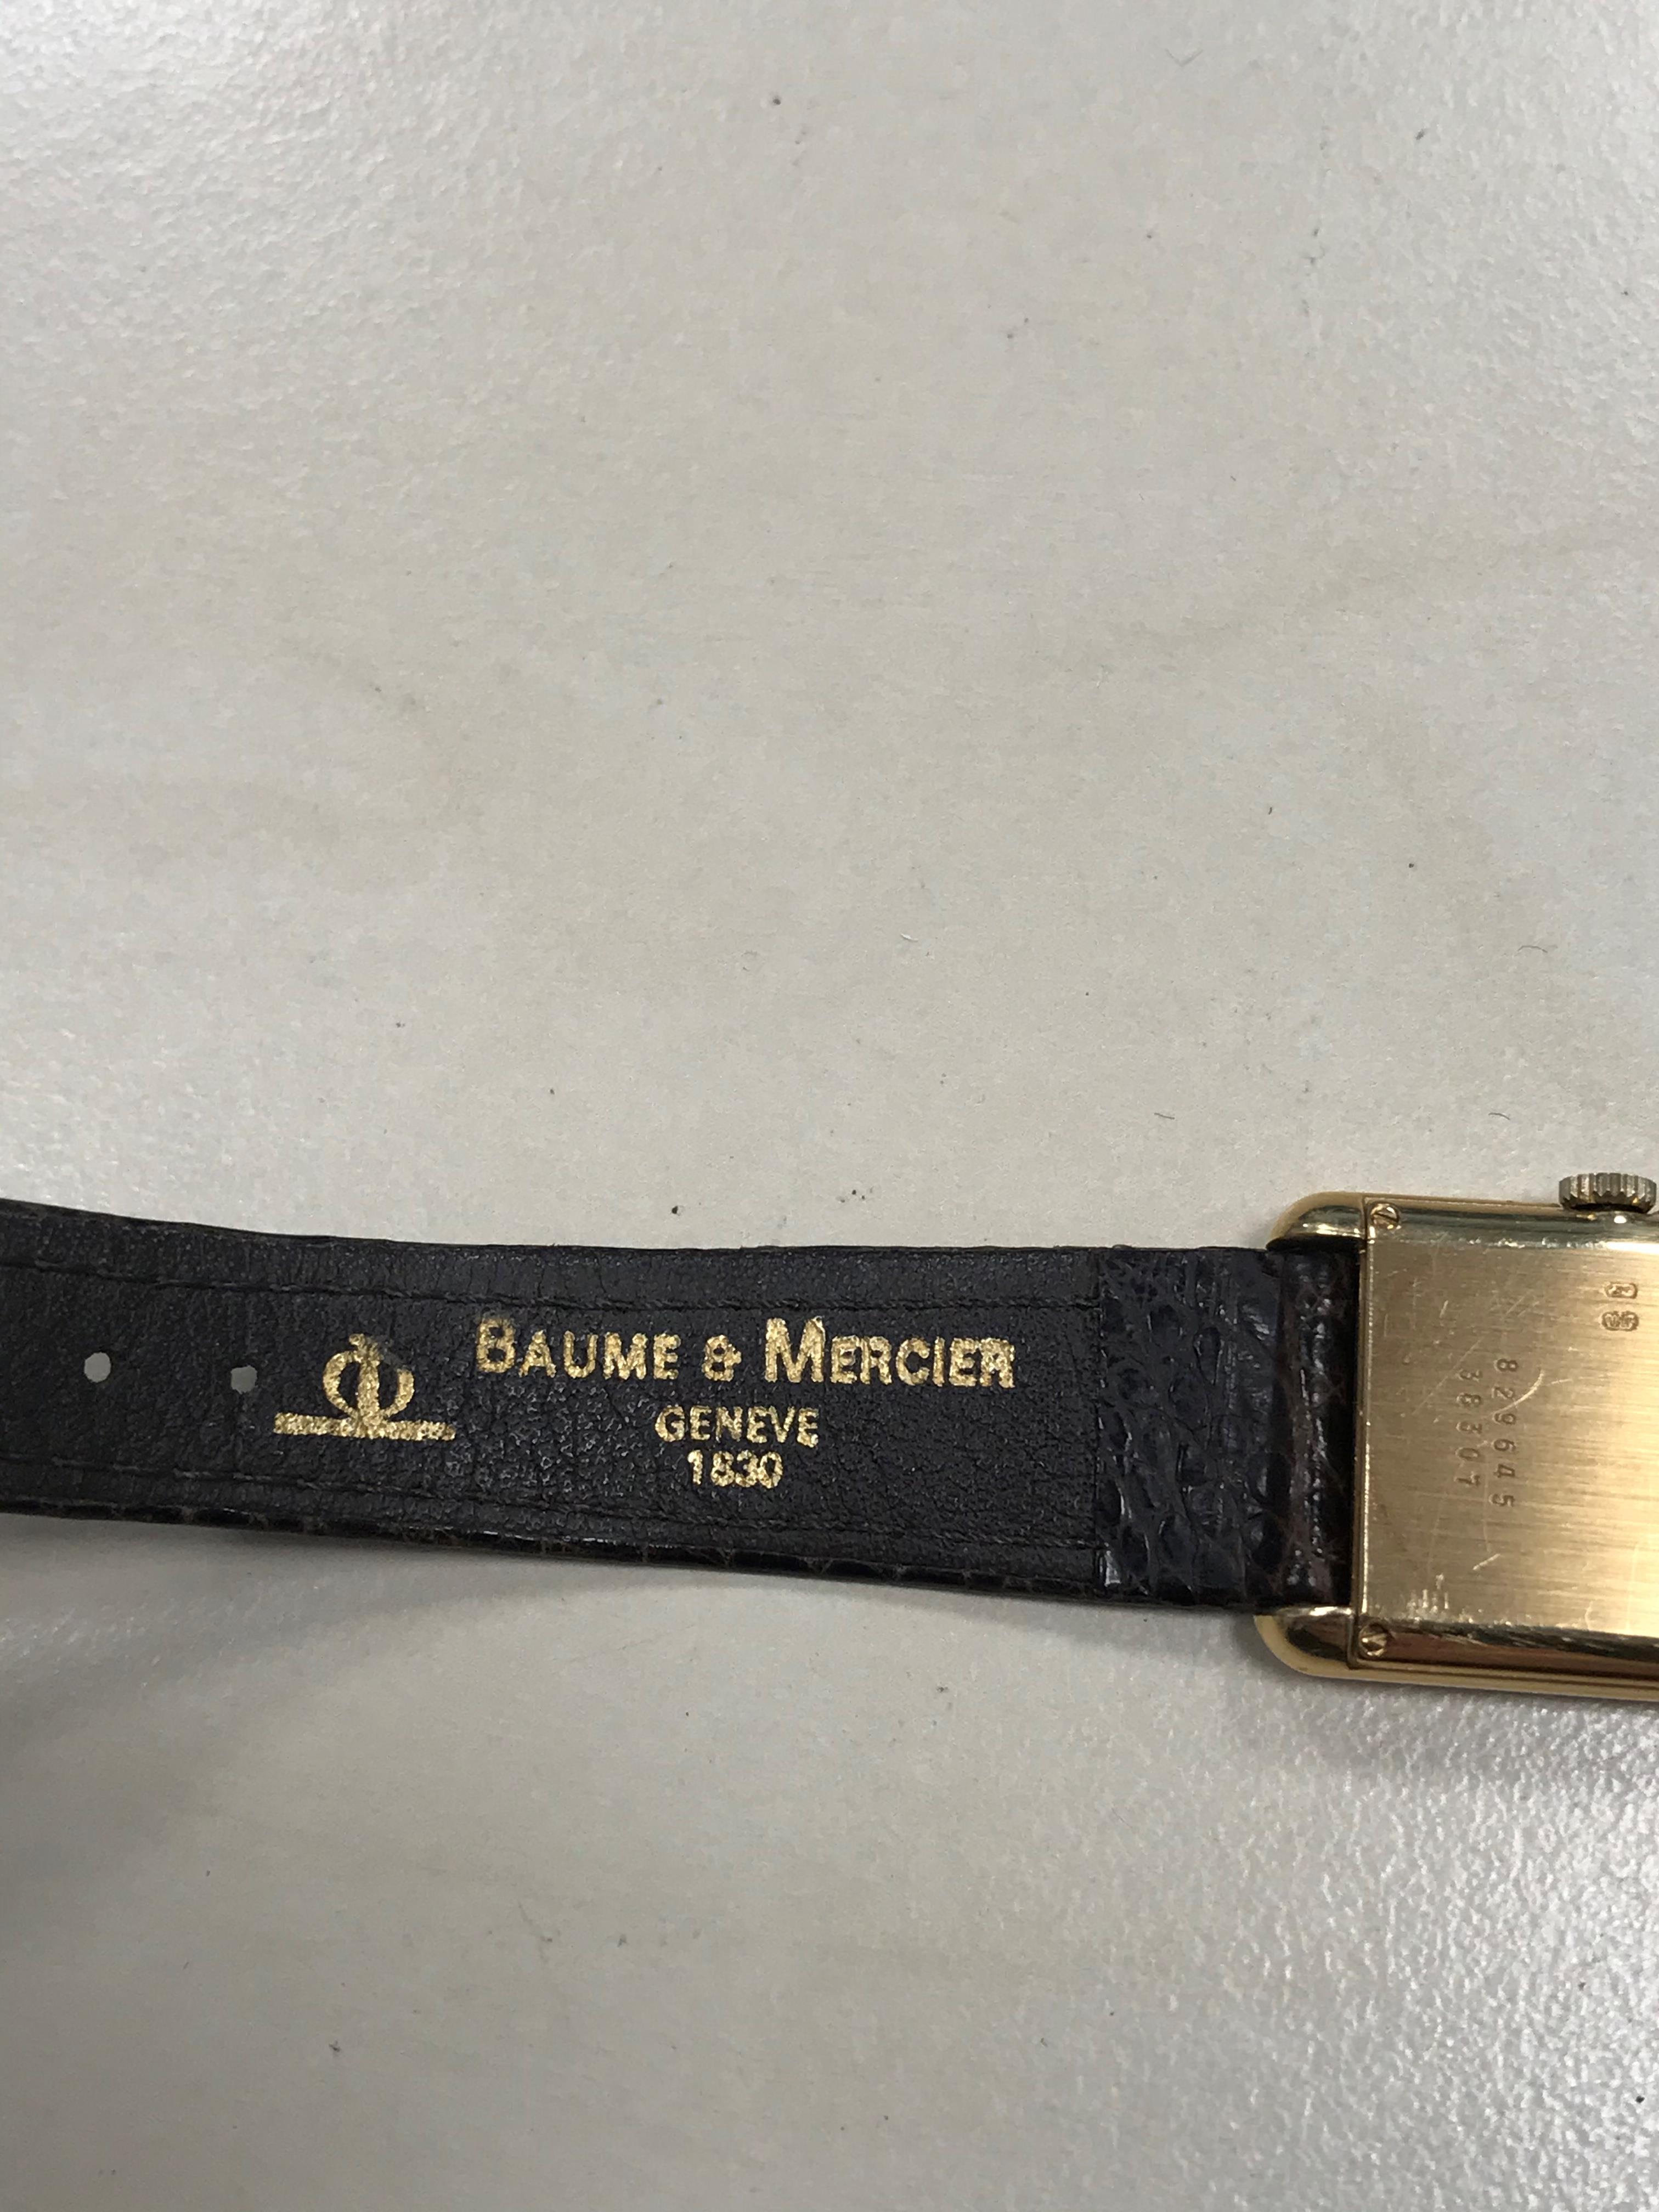 Lot 733 - A LADY'S BAUME & MERCIER GOLD WATCH